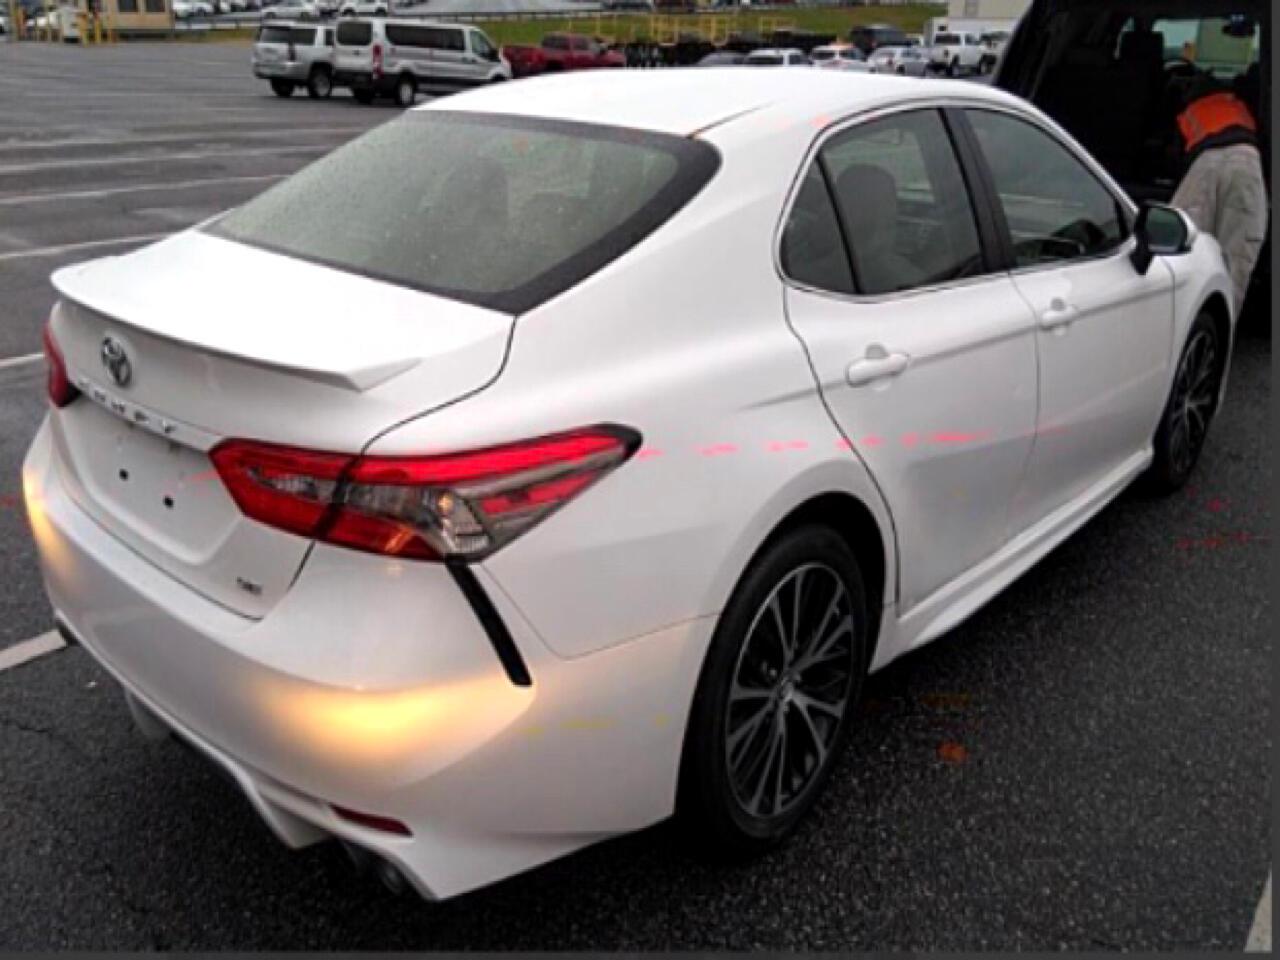 2018 Toyota Camry 4dr Sdn I4 Auto SE (Natl)